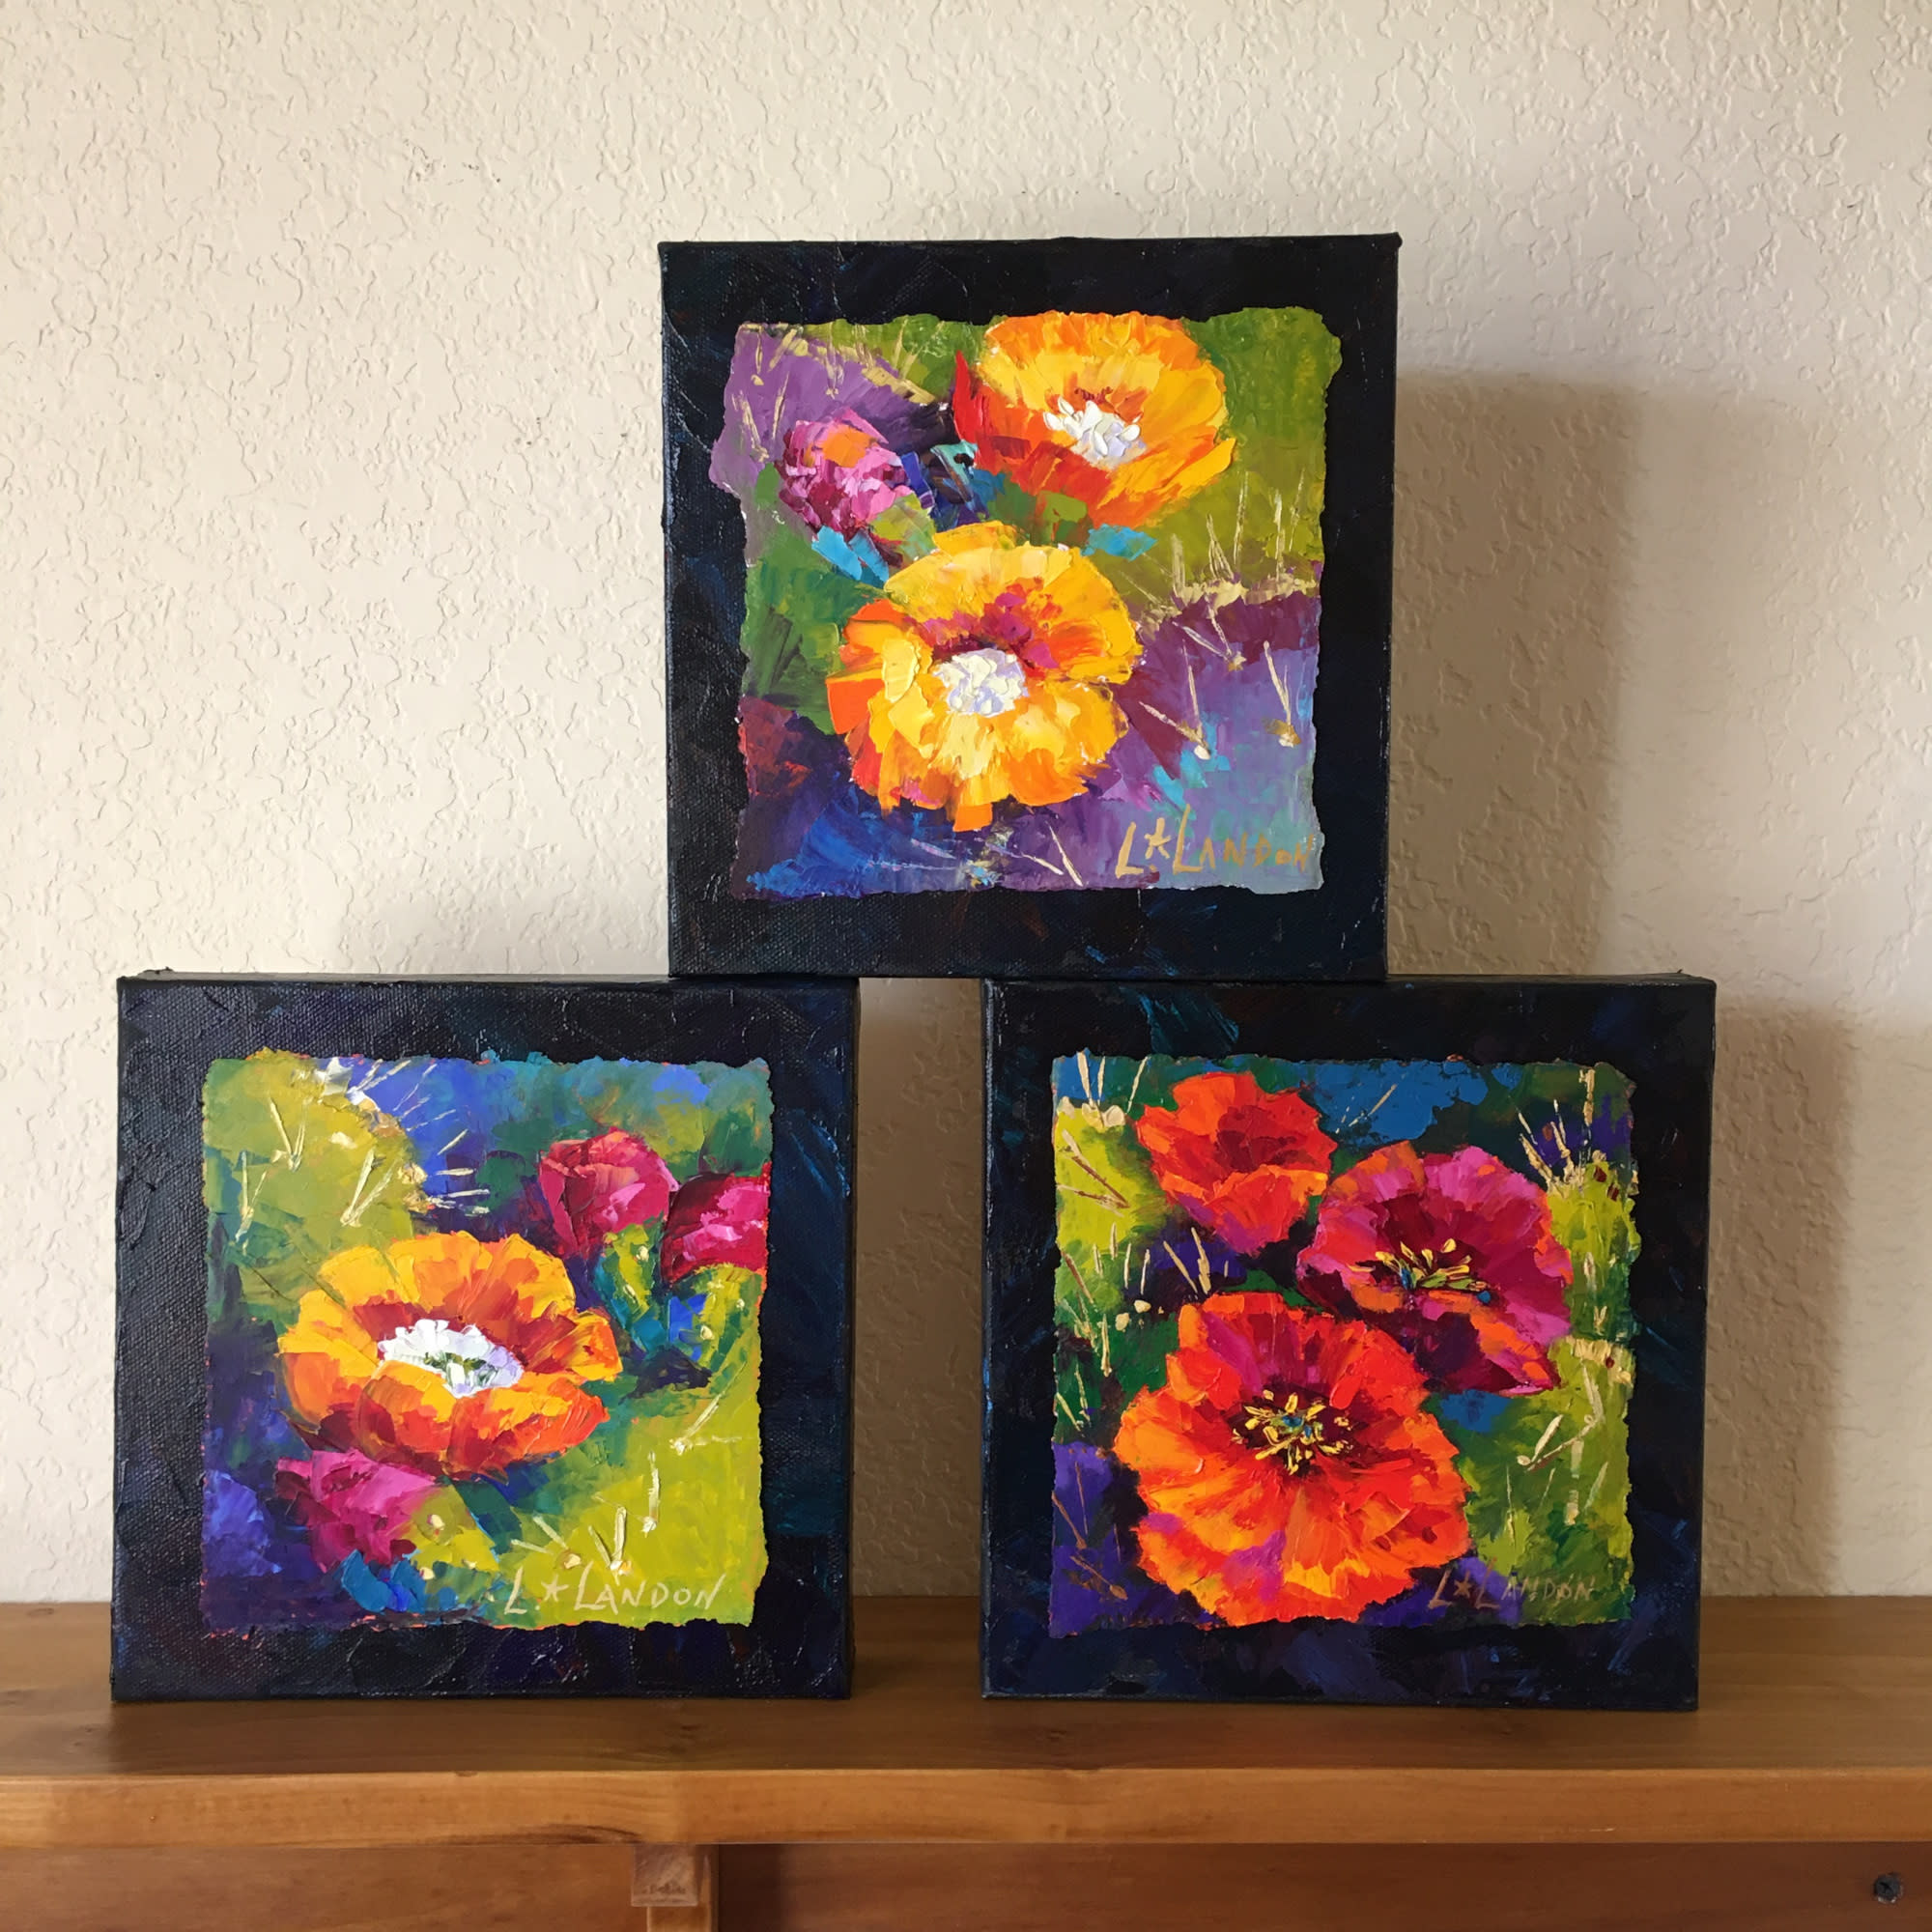 Cactus blossoms trio 4 orig asf wbst drp3ht